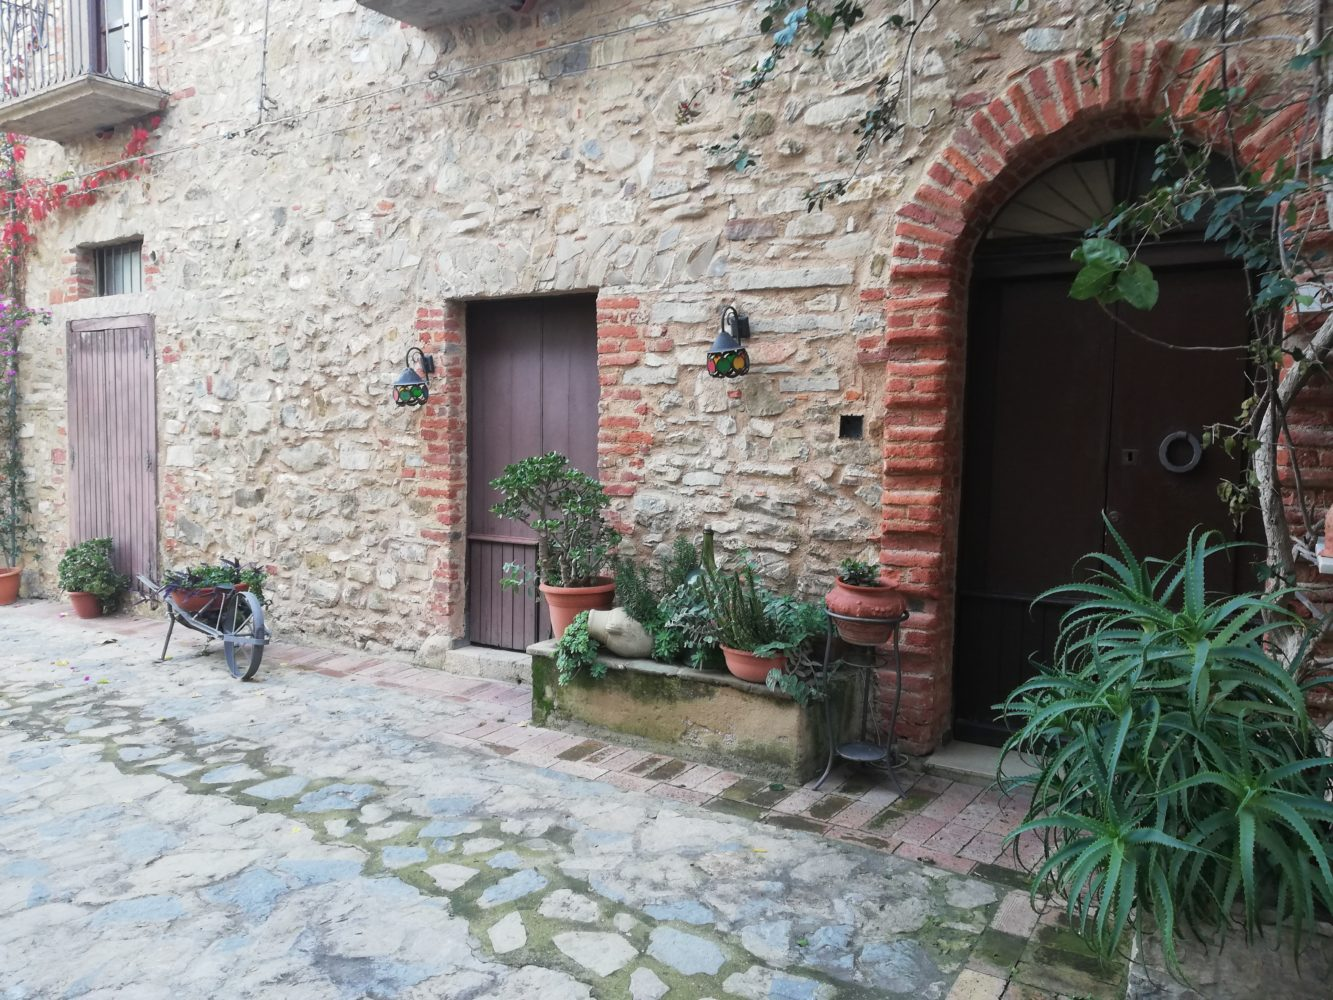 Casal Velino paese centro storico (2)